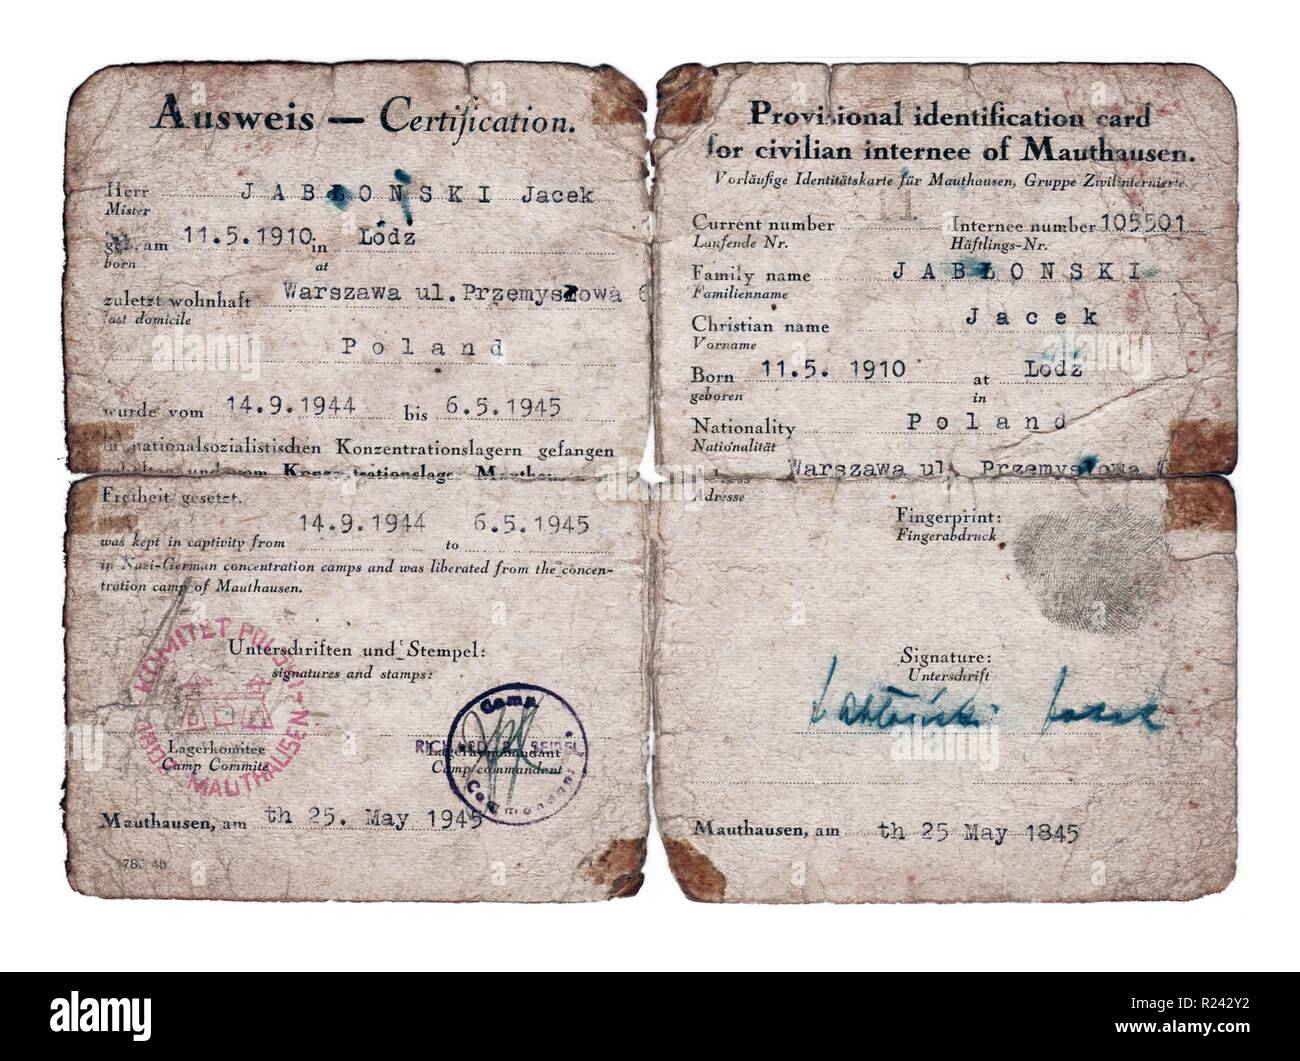 World War Two; Post-liberation identification paper for a former Mauthausen Concentration Camp prisoner called Jacek Jablonski 1945 - Stock Image